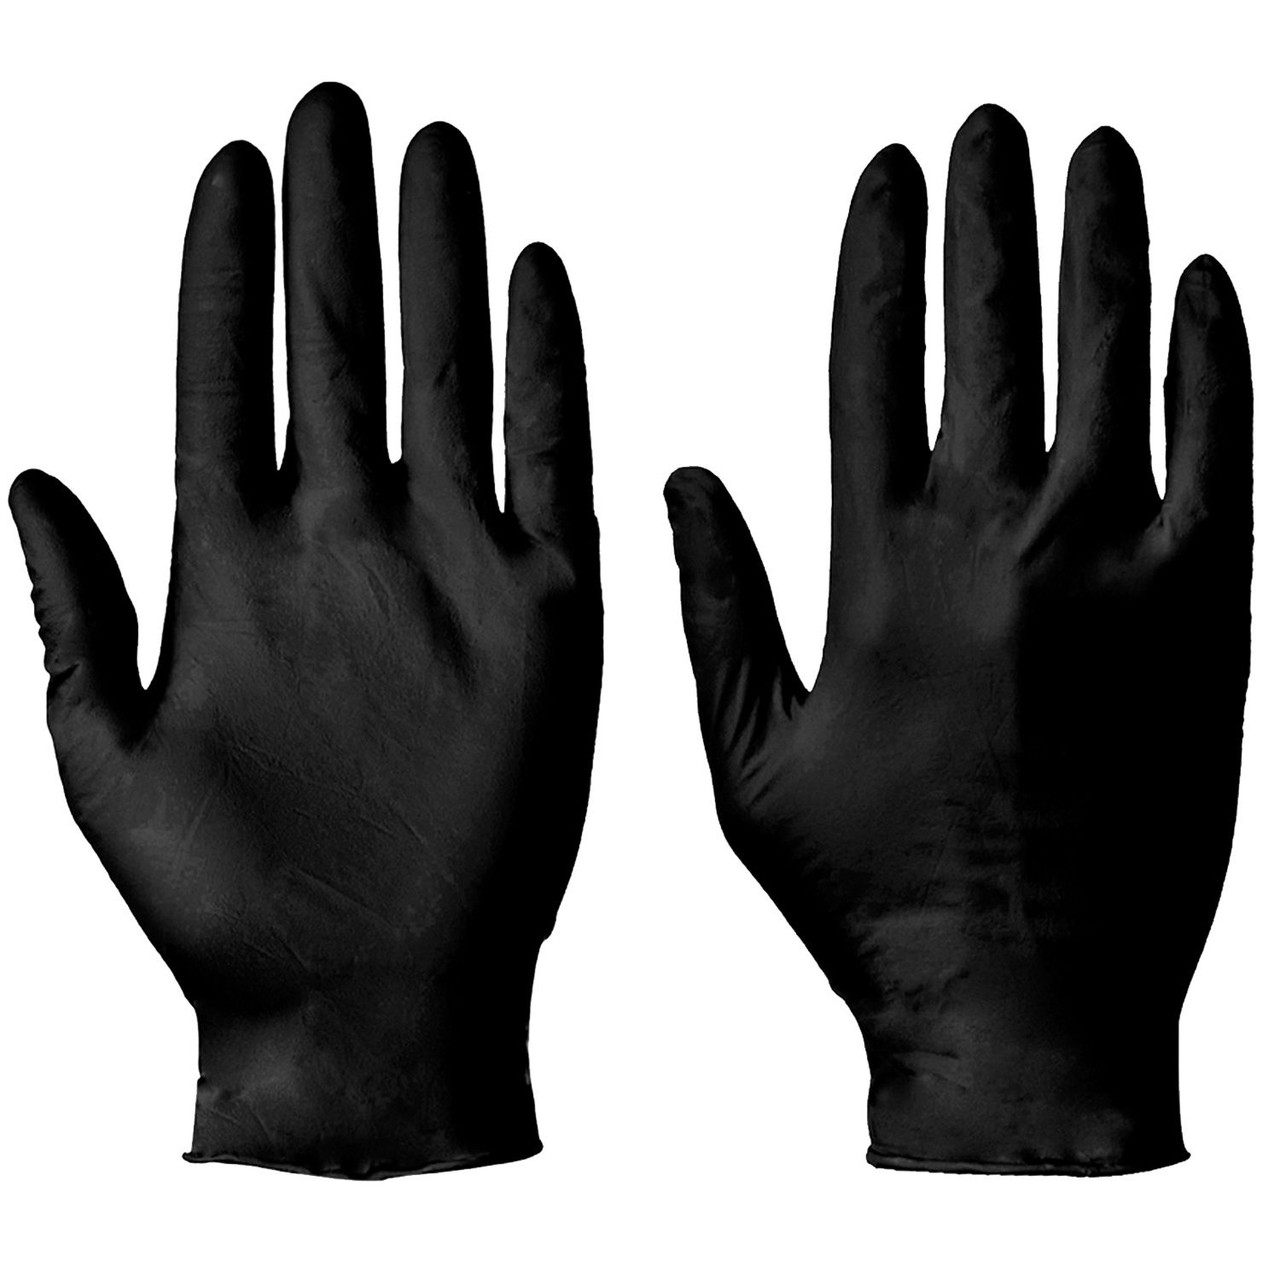 Gloves Black Nitrile Powder Free Pack Size 100 Gloves